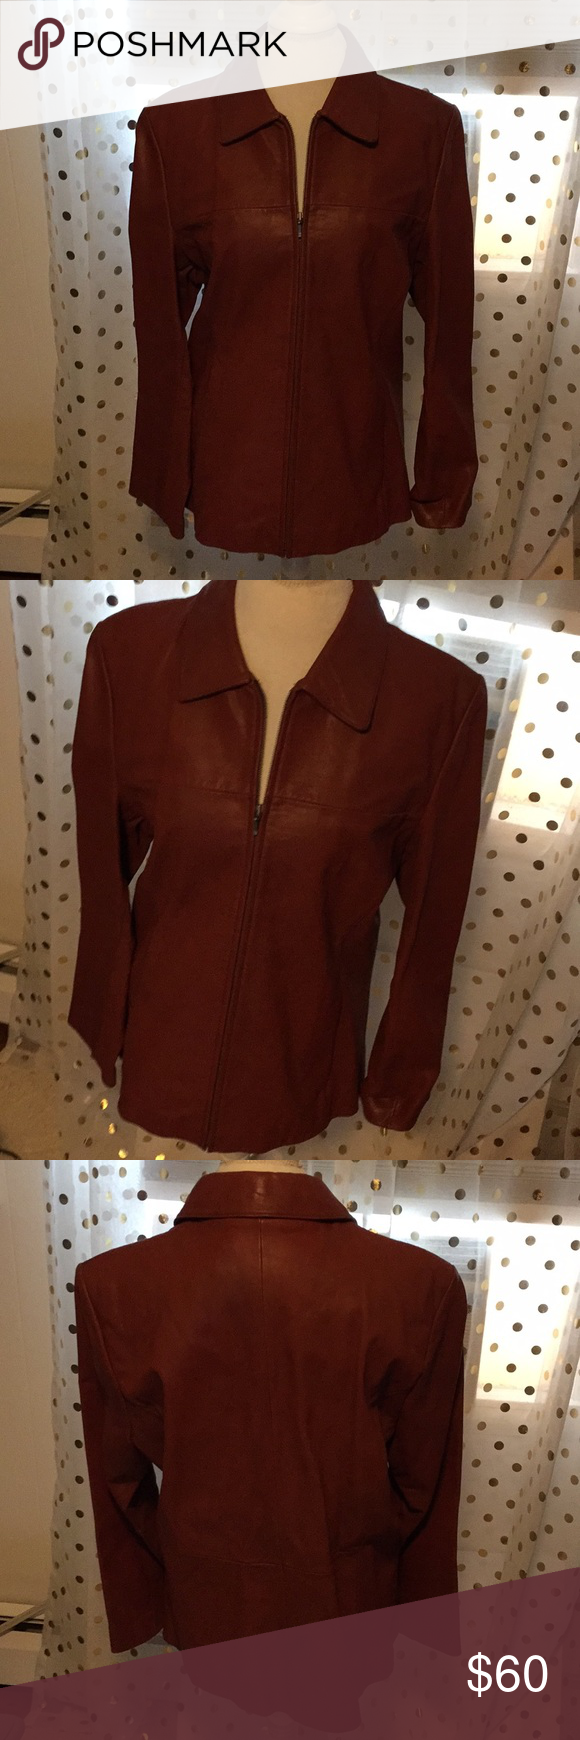 Wilsons Leather Pelle Studio XL Zip Up Jacket EUC (With